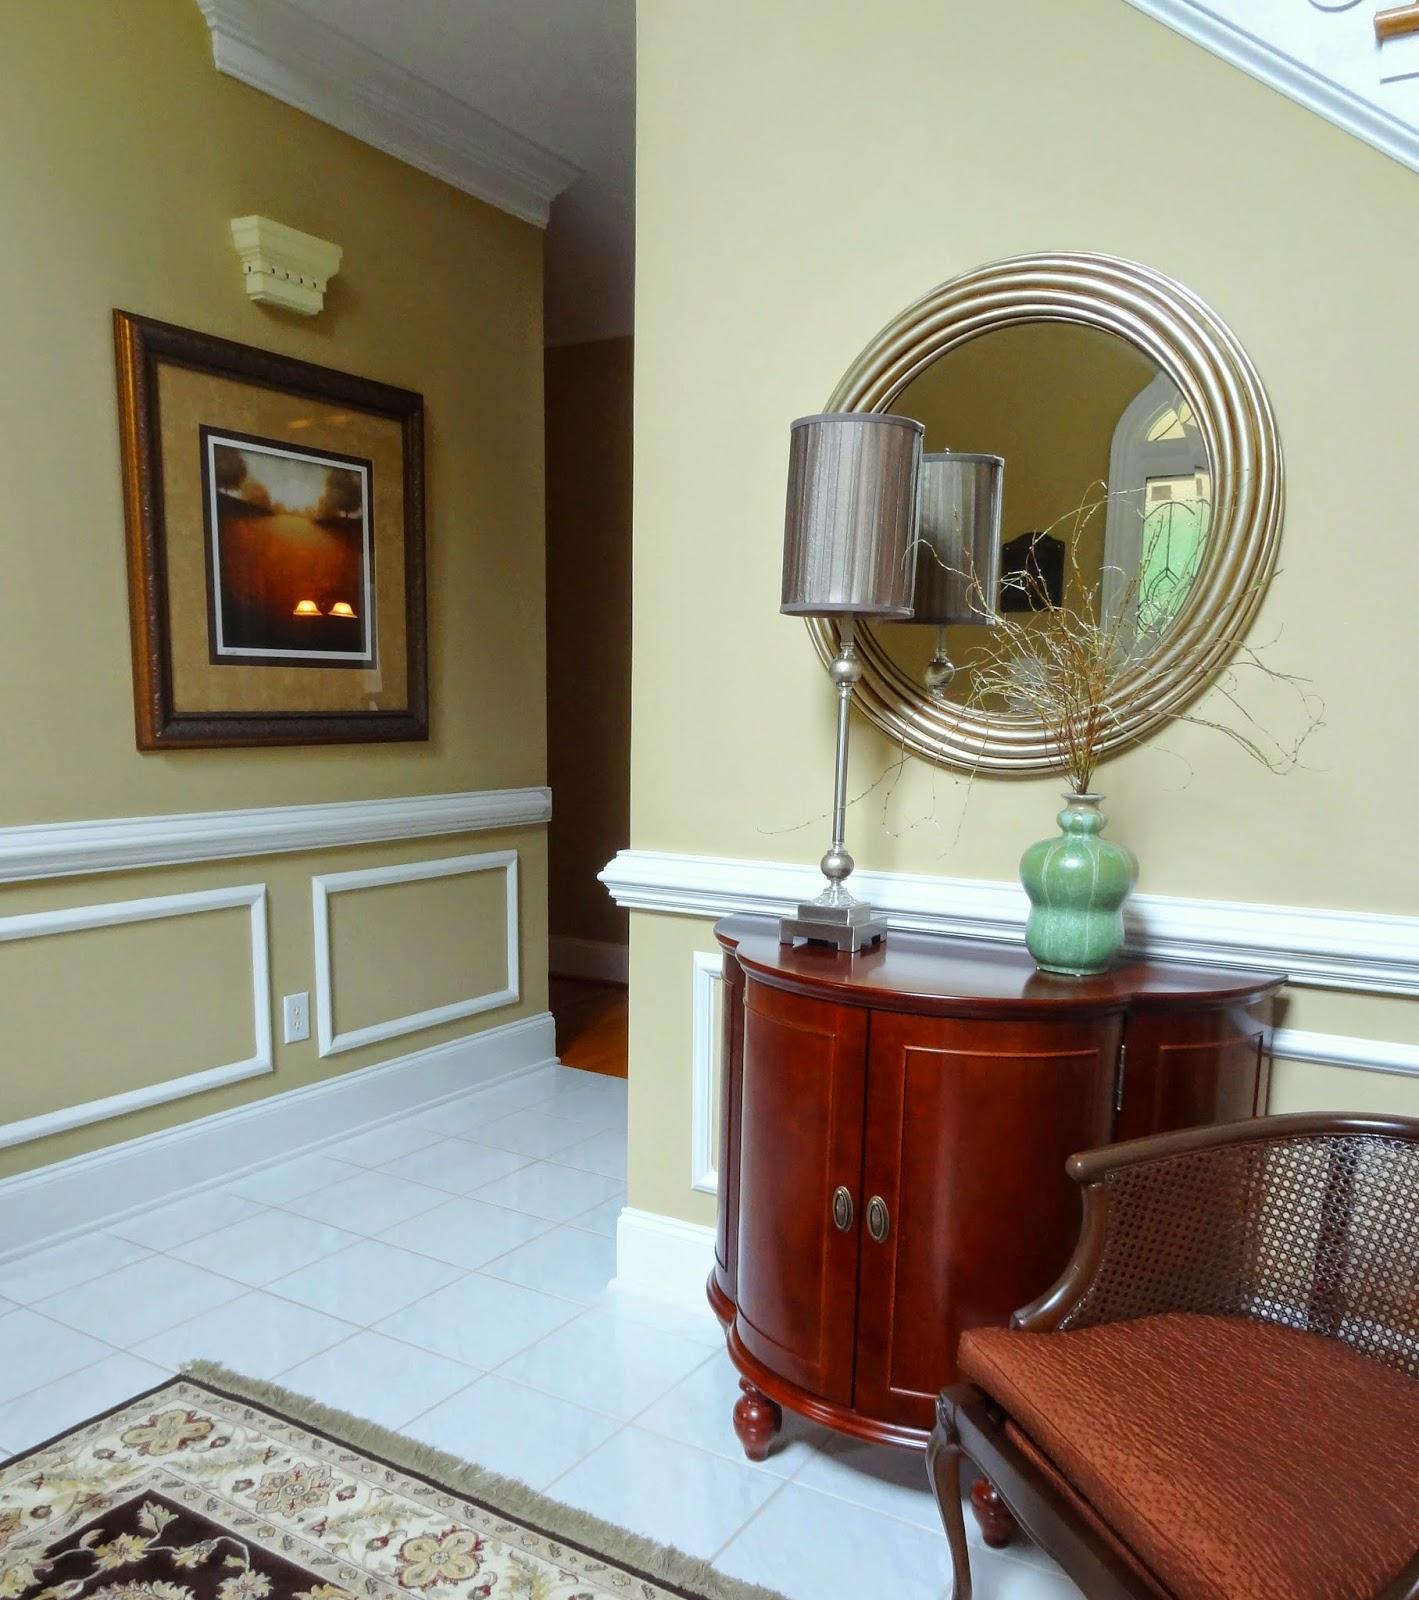 resort nc greensboro our international and hotelresidentialinternational design villa firm designers mbid interior